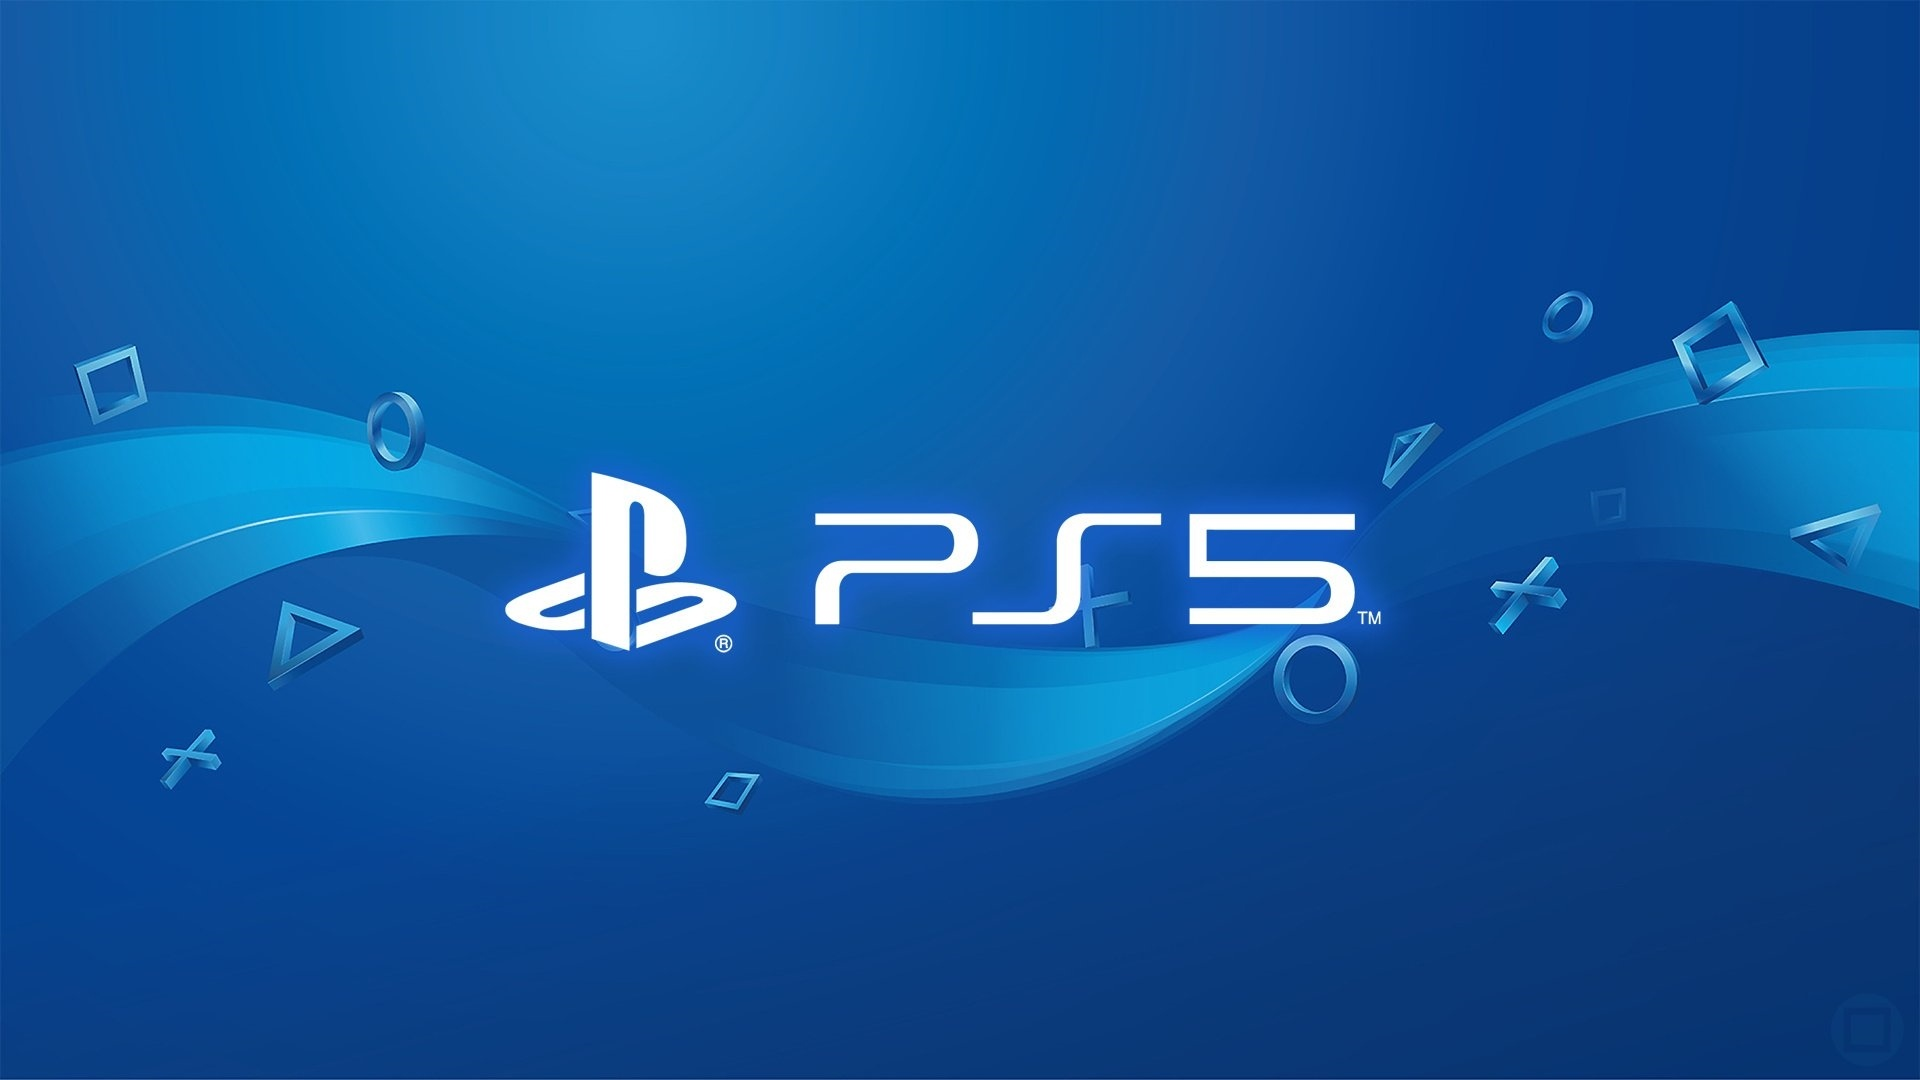 Playstation 5 Free Wallpaper